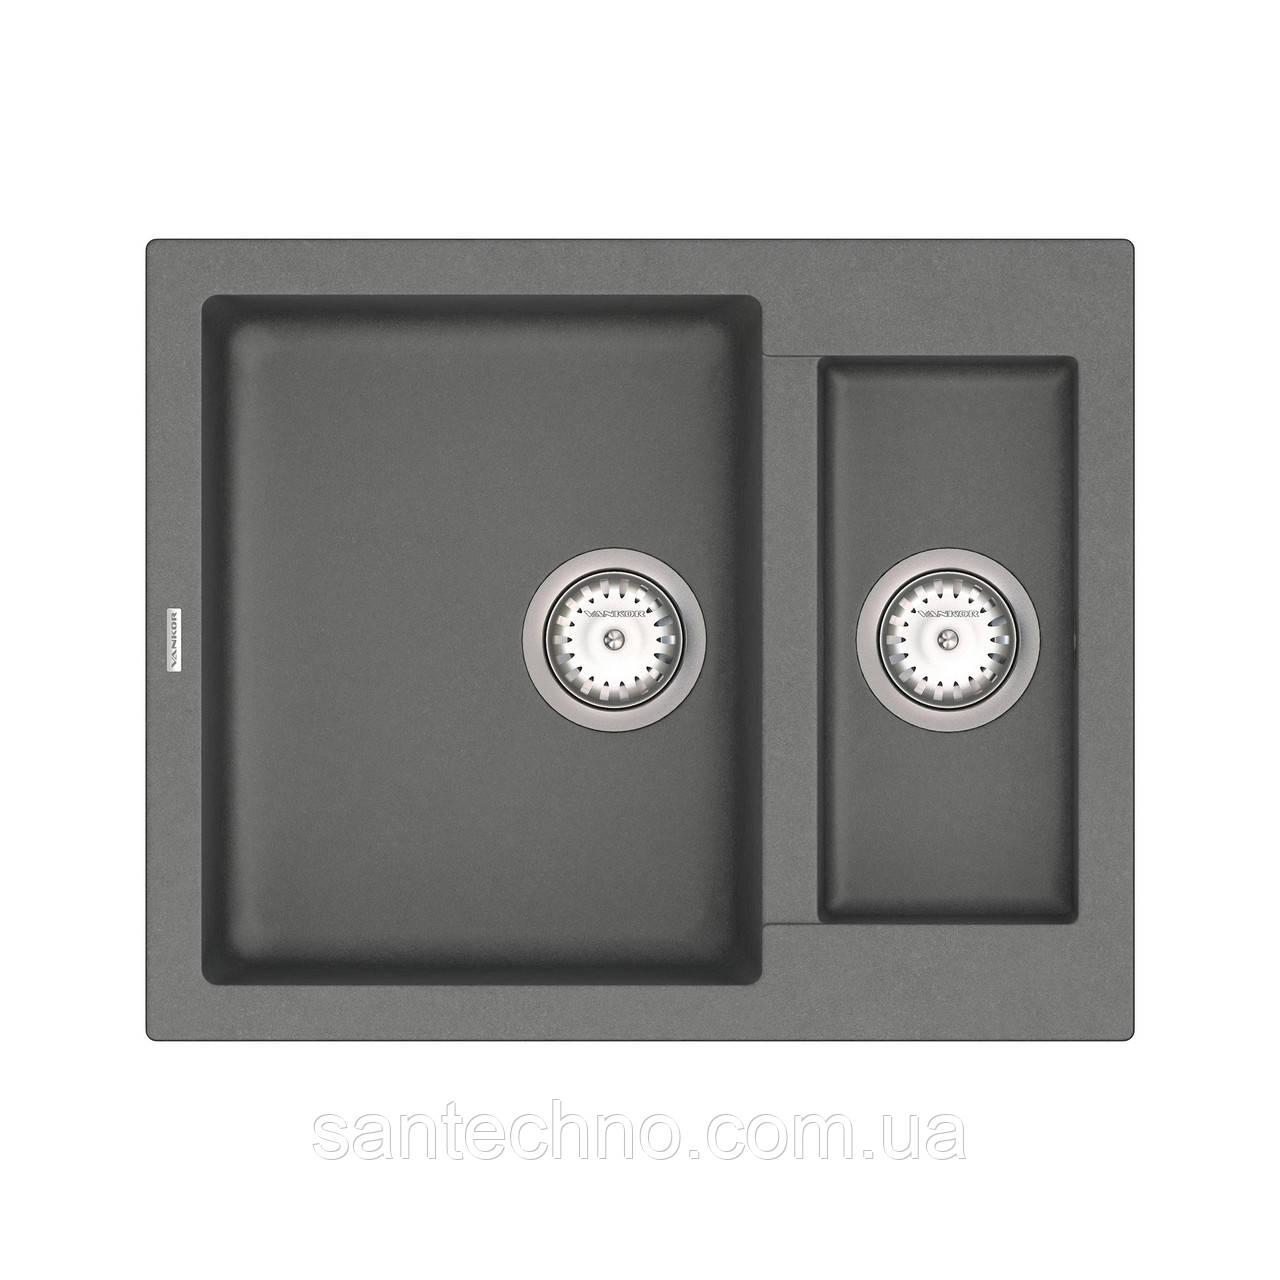 Кухонная мойка из камня на 2 чаши VANKOR Orman OMP 03.61 Gray + сифон VANKOR